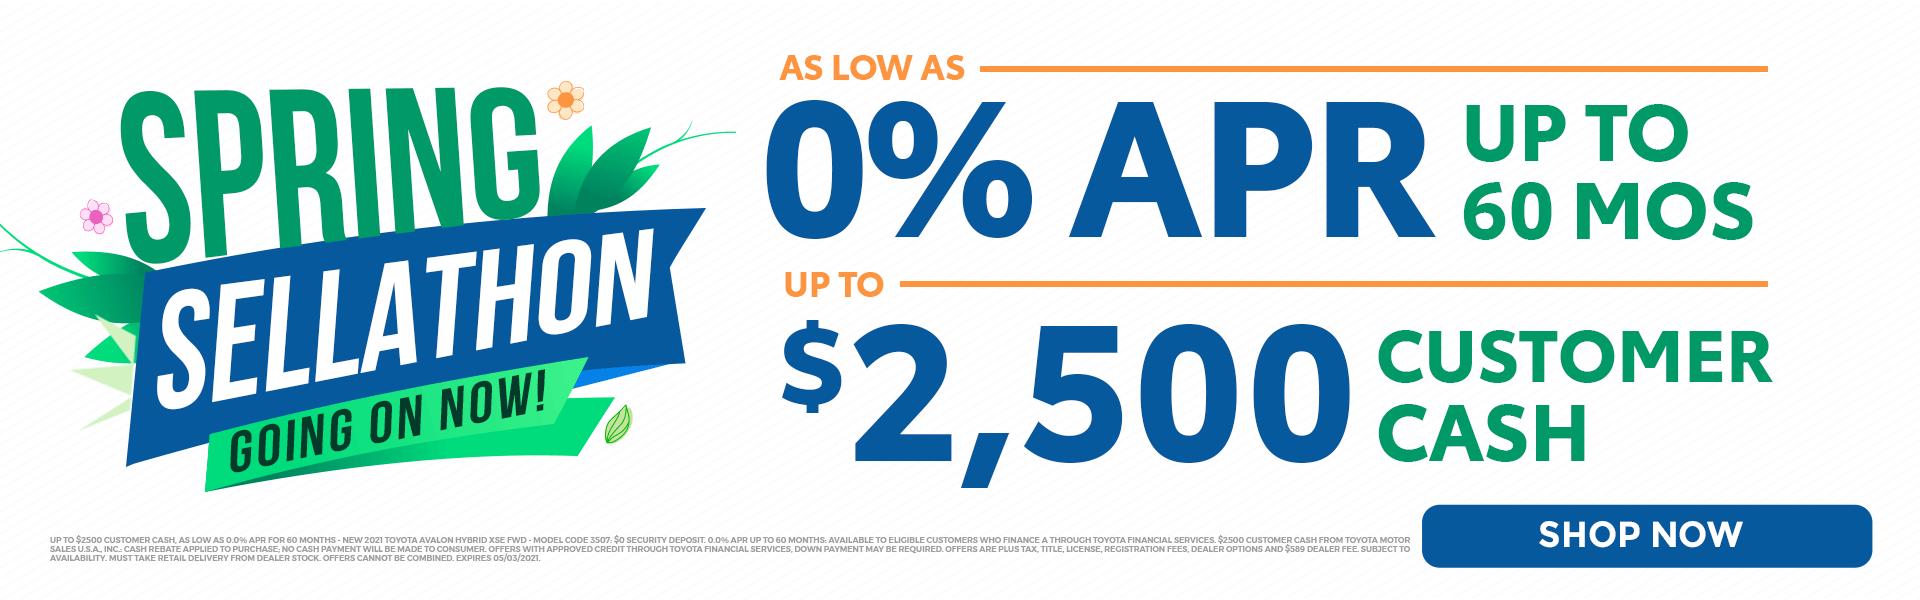 0% APR 60 MONTHS